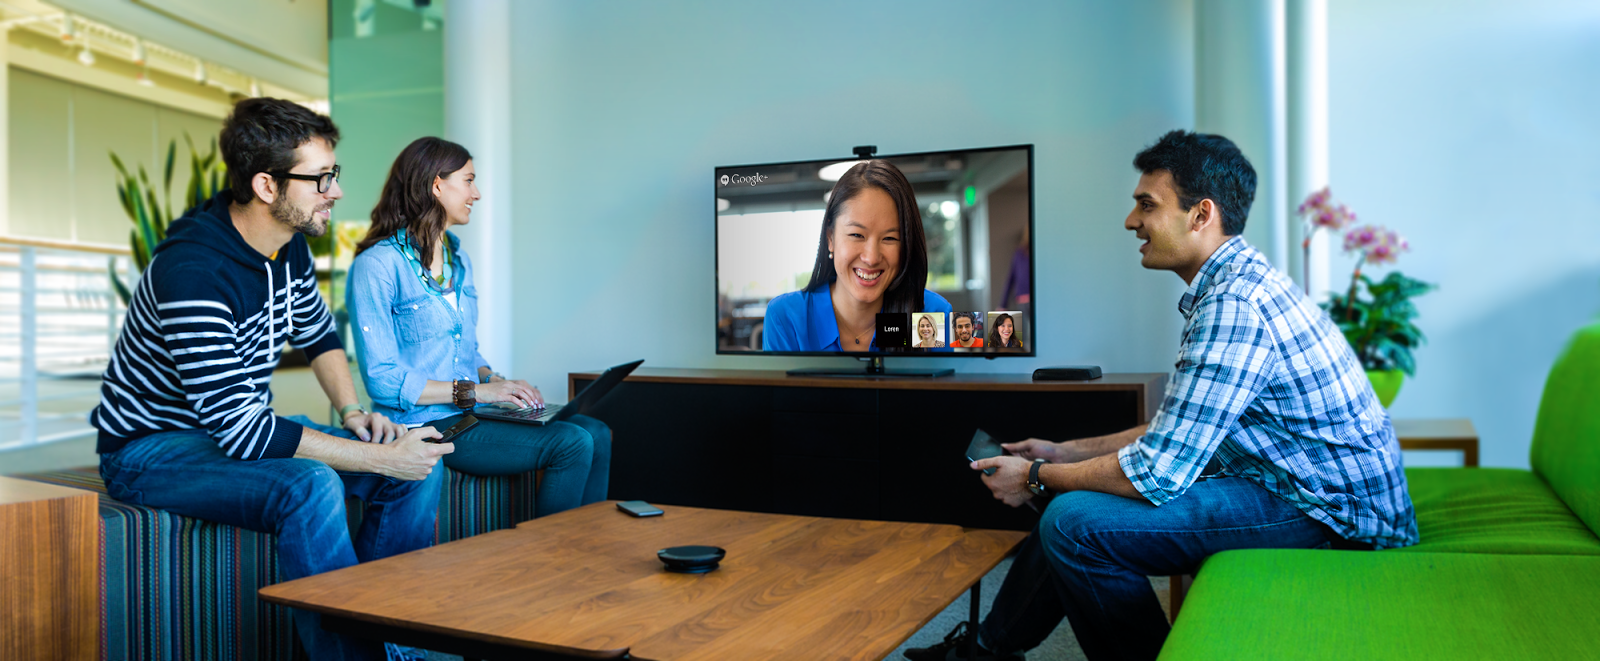 Chromebox video meeting